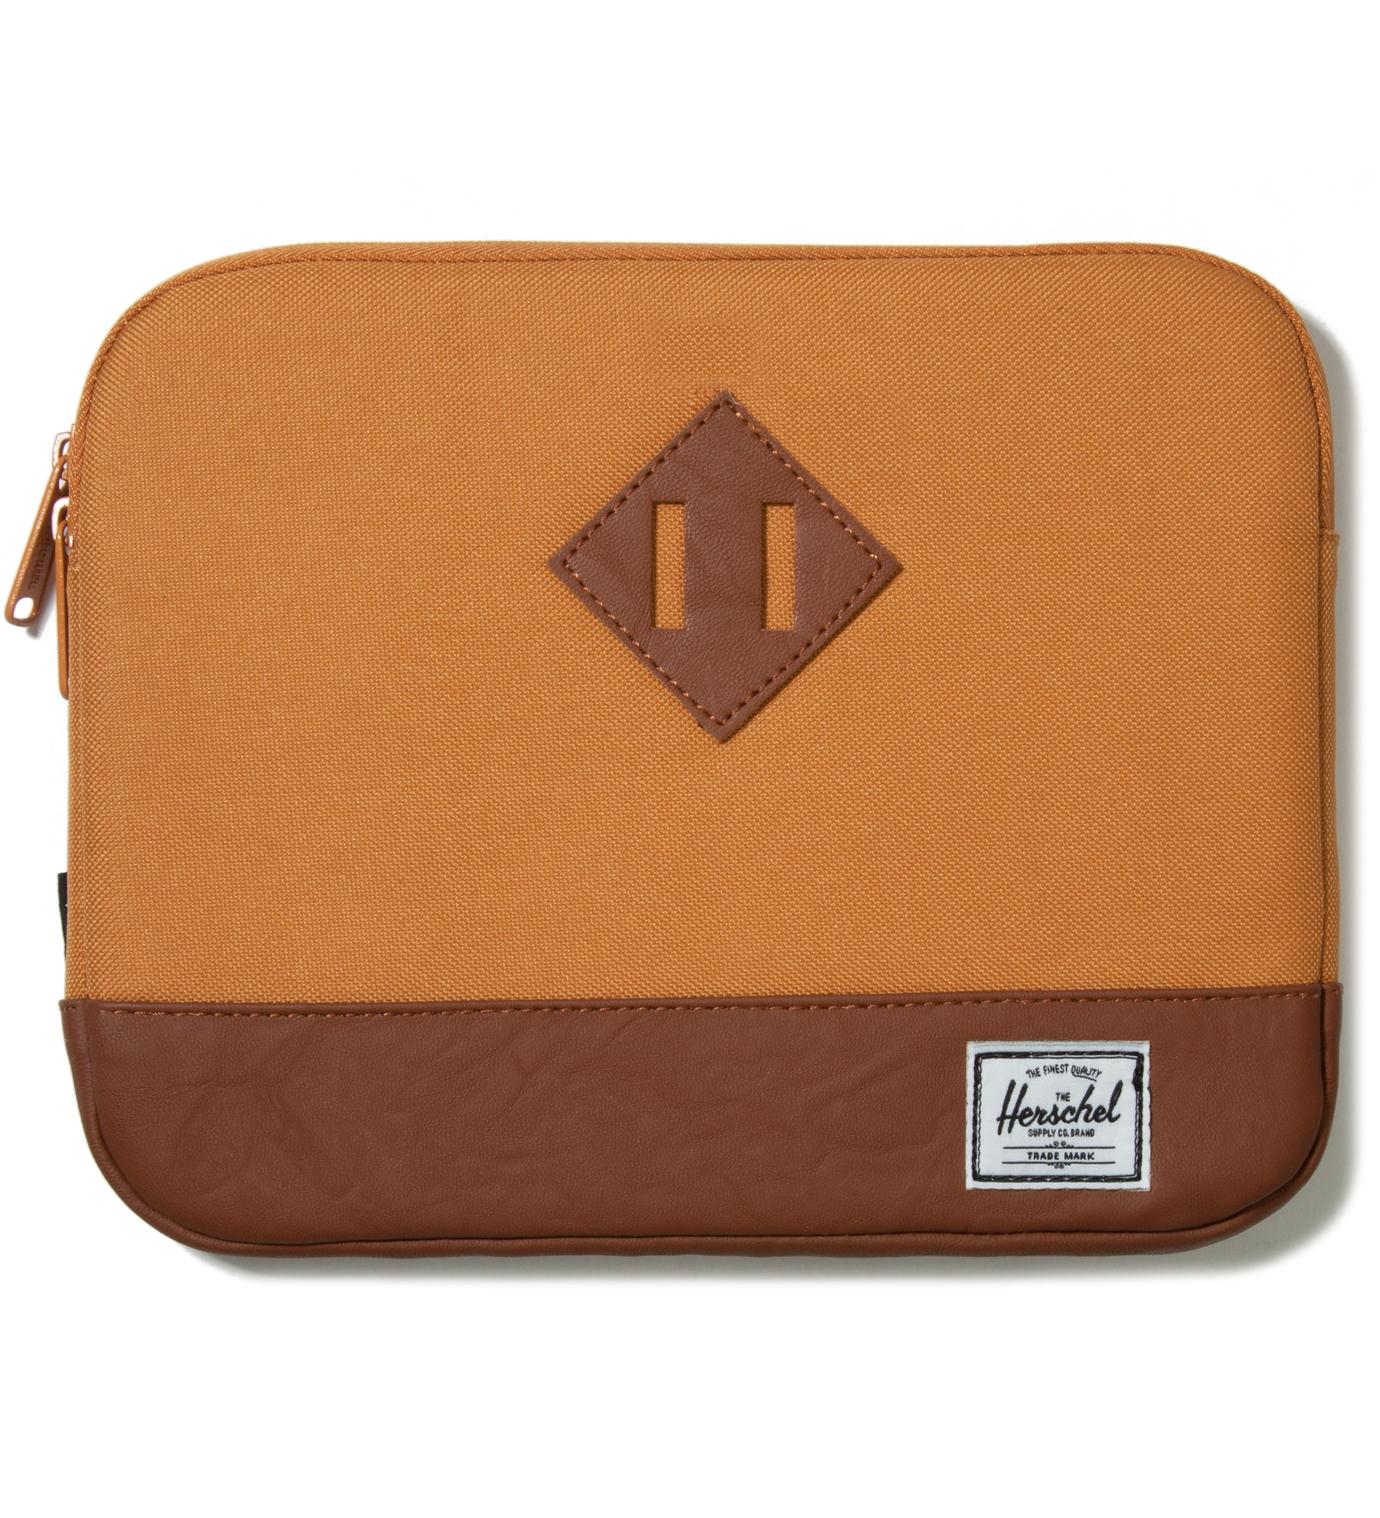 Herschel Supply Co. Butterscotch Heritage iPad Sleeve